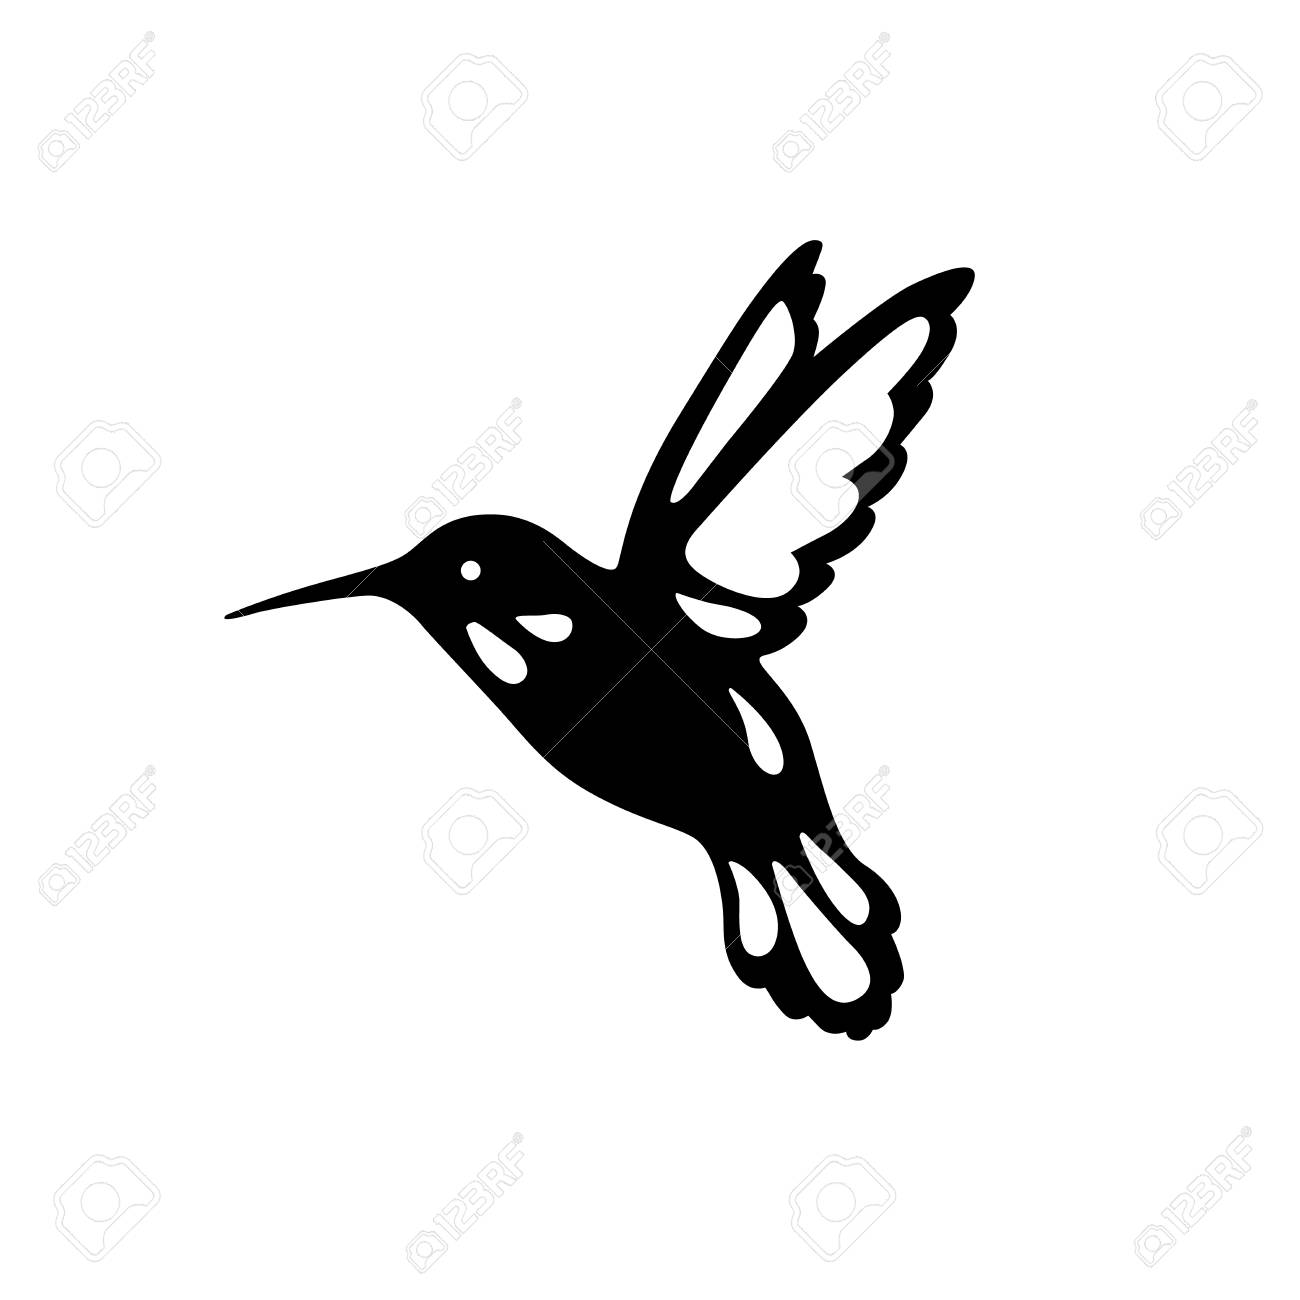 Bird of hummingbirds, outline, black shadow, laser cutting. - 93380959